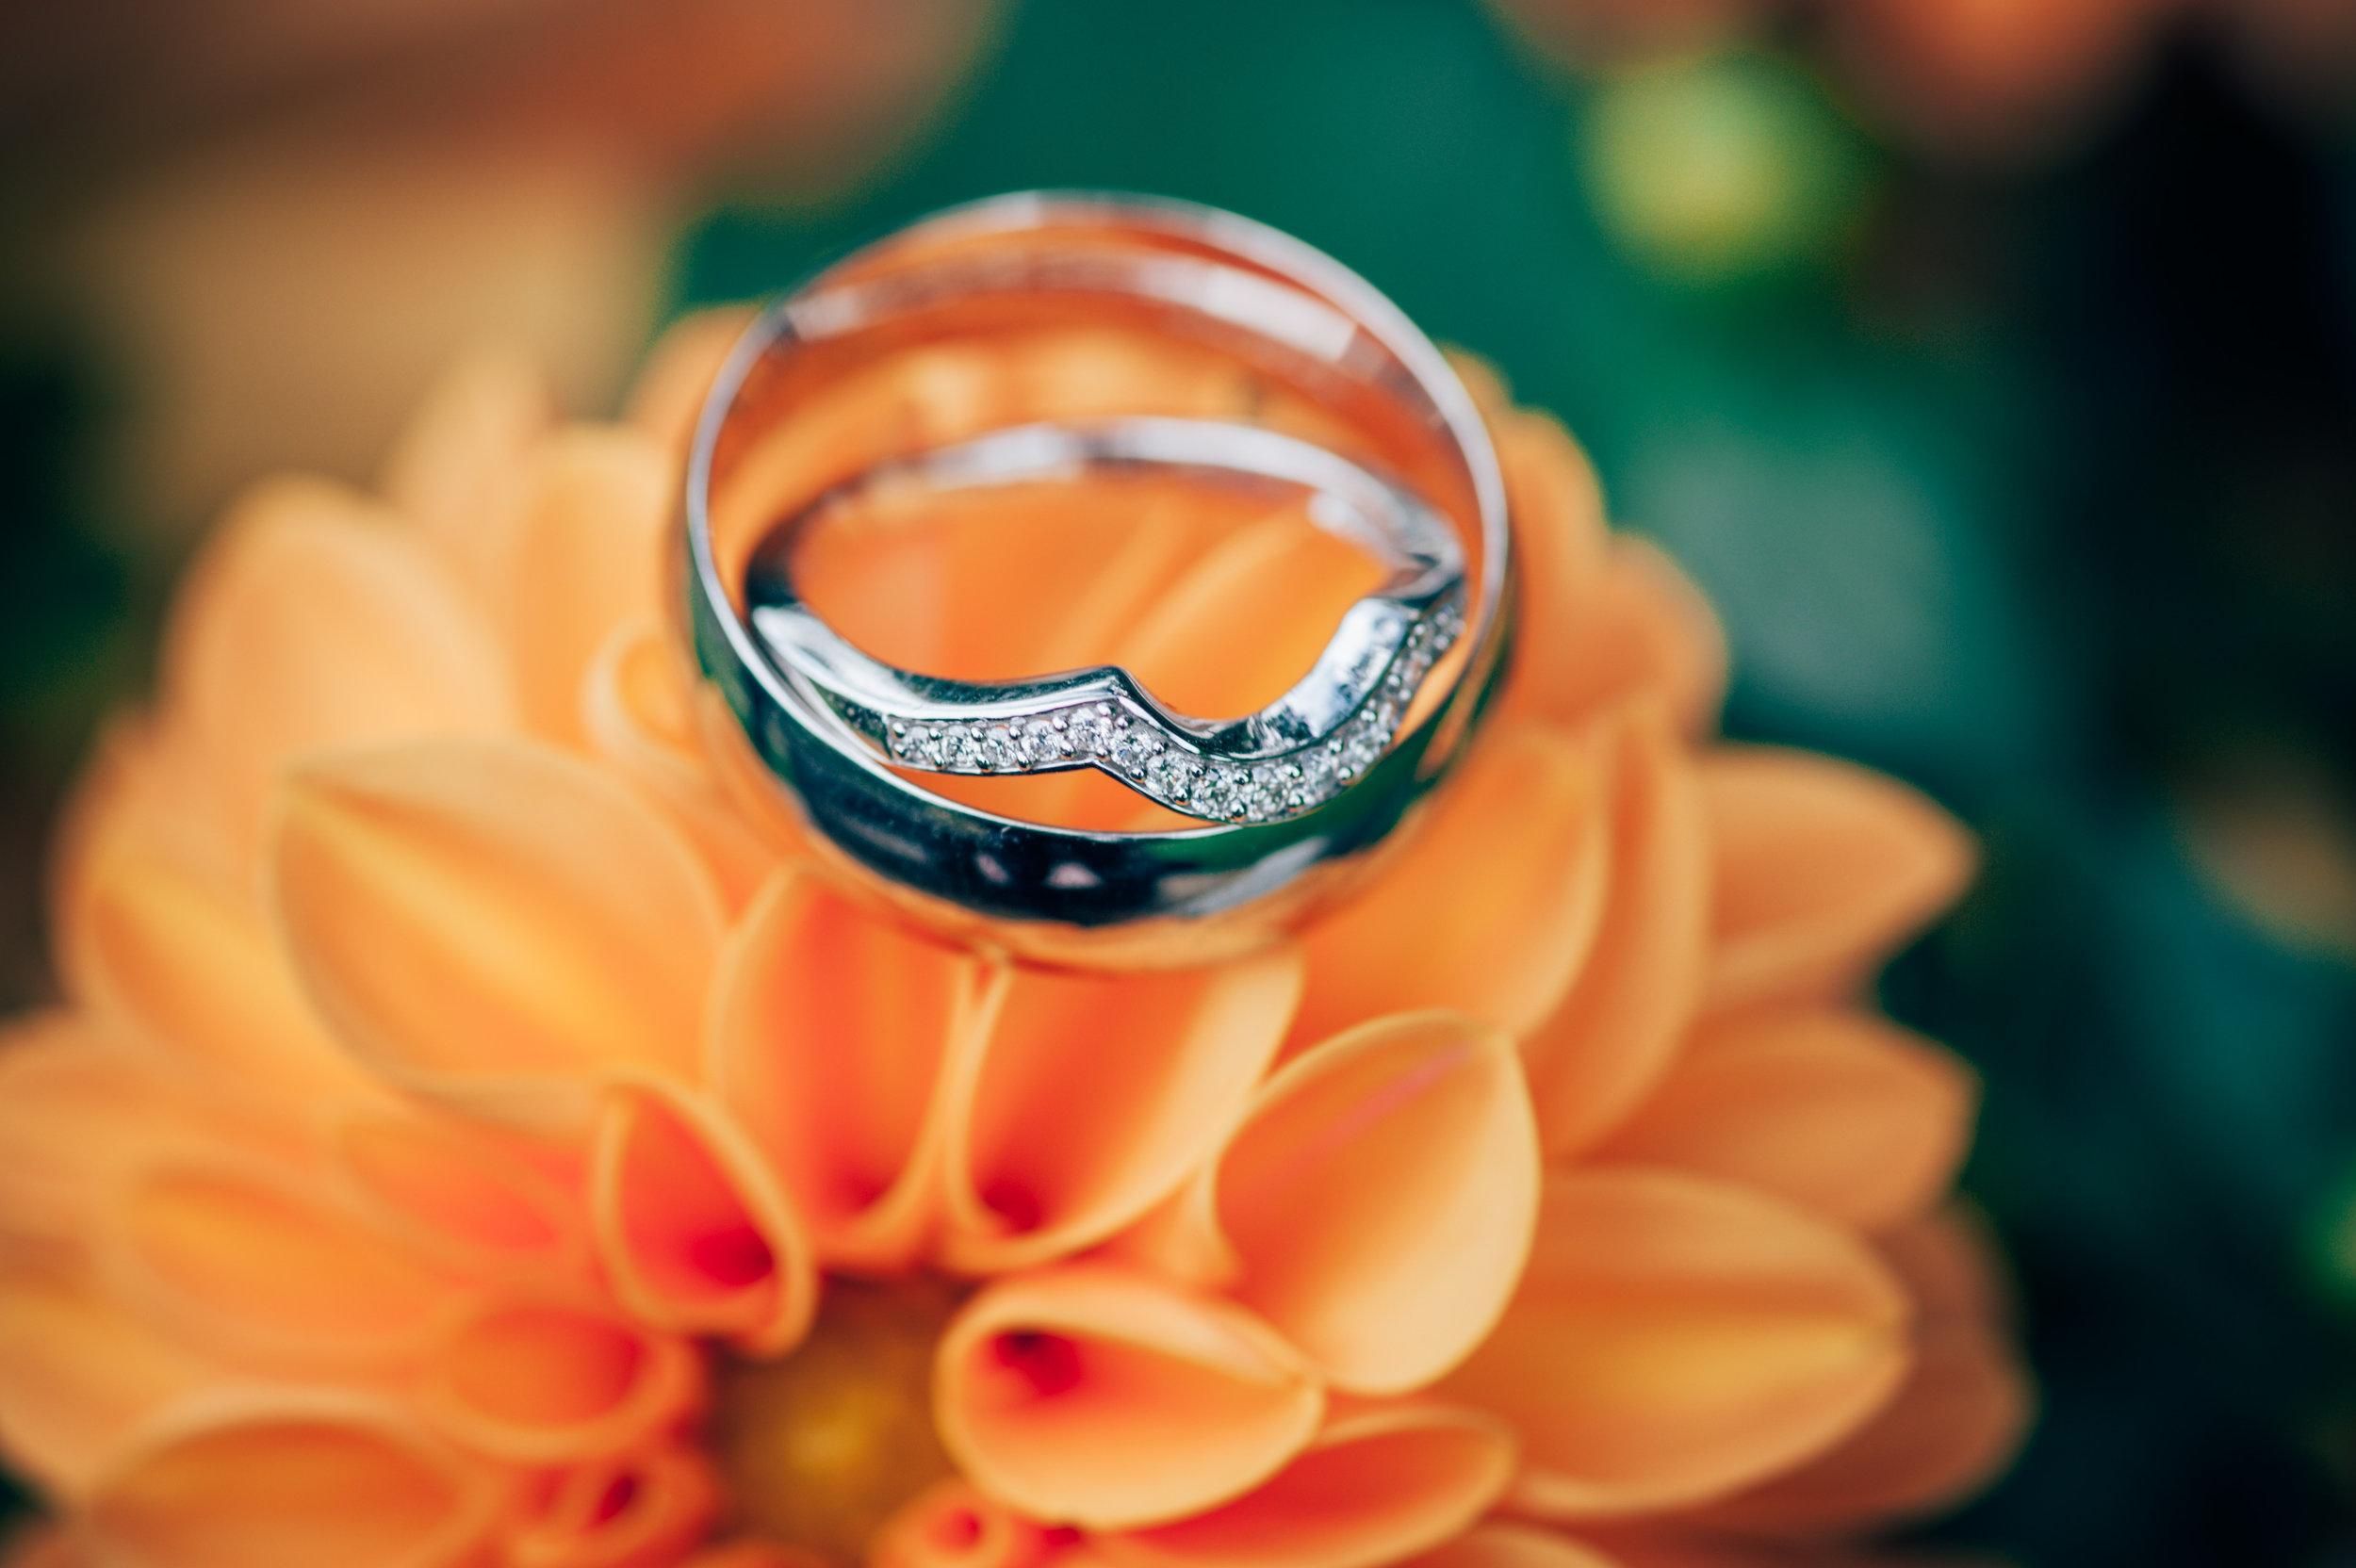 Wedding Rings on orange flower